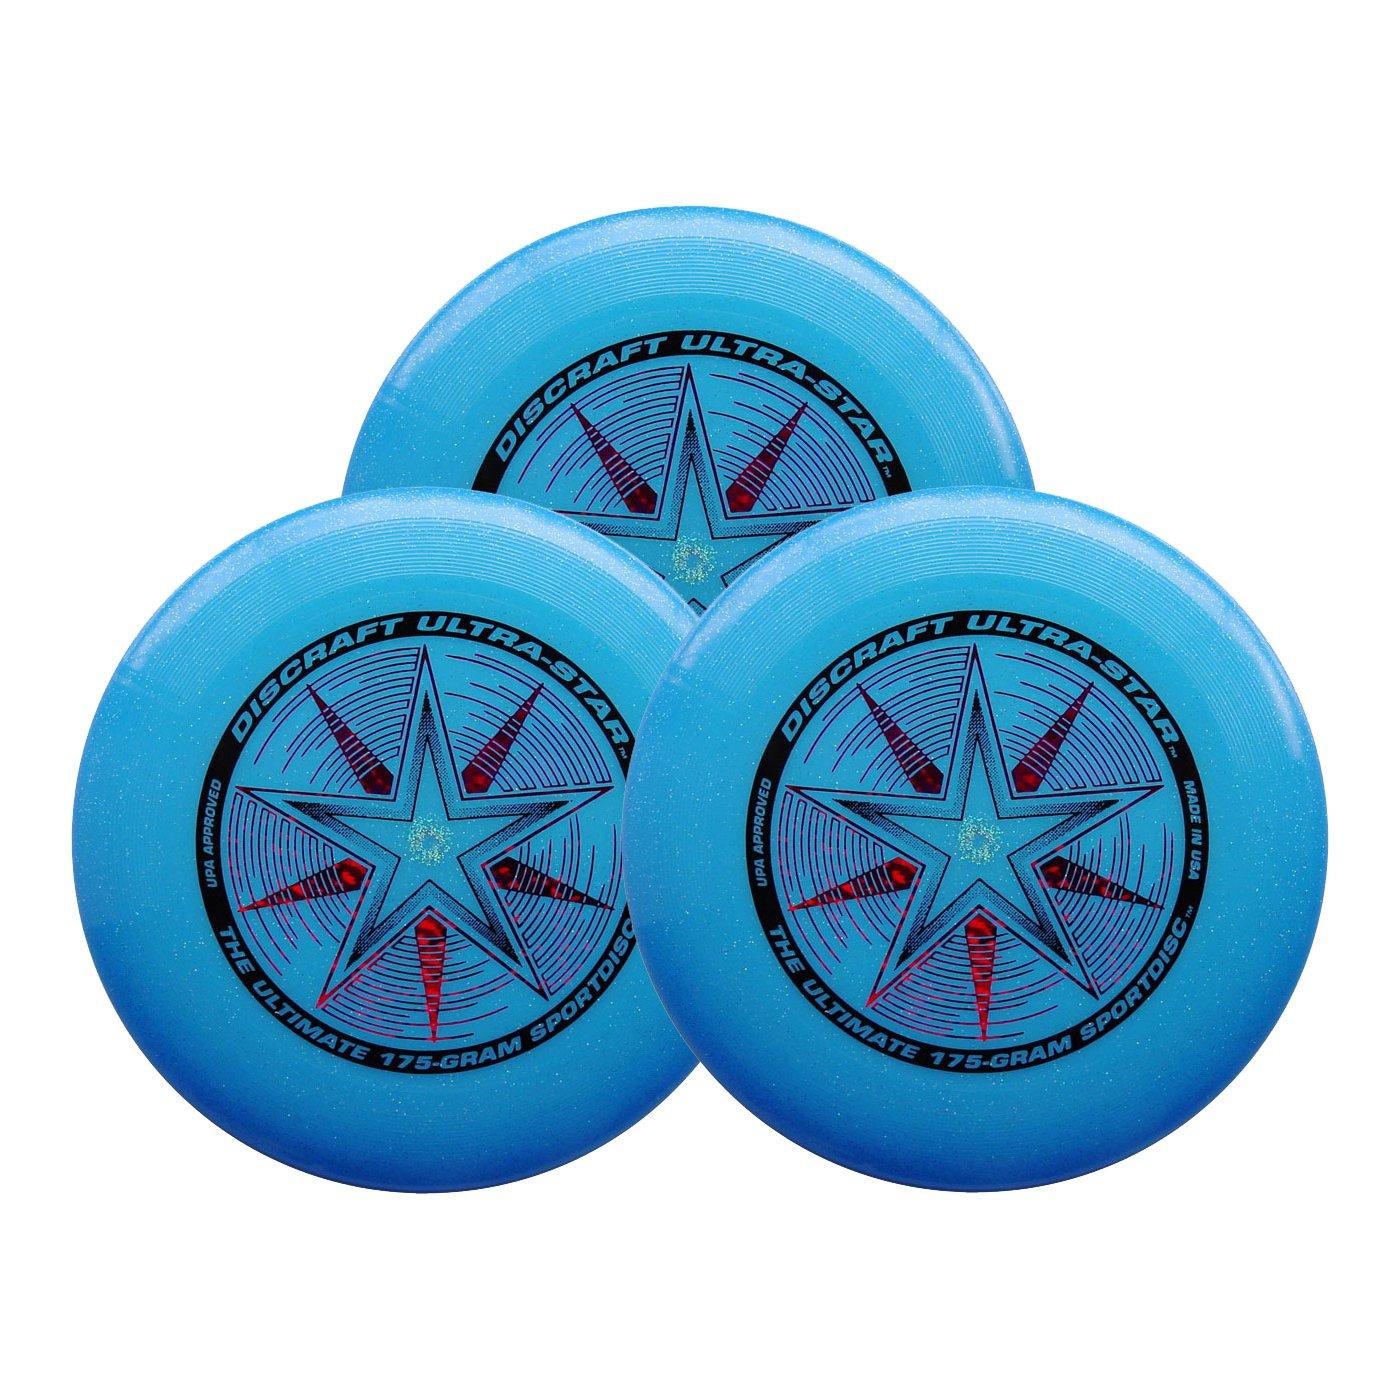 Discraft Ultra-Star 175g Ultimate Sportdisc Blue Sparkle (3 Pack) by Discraft